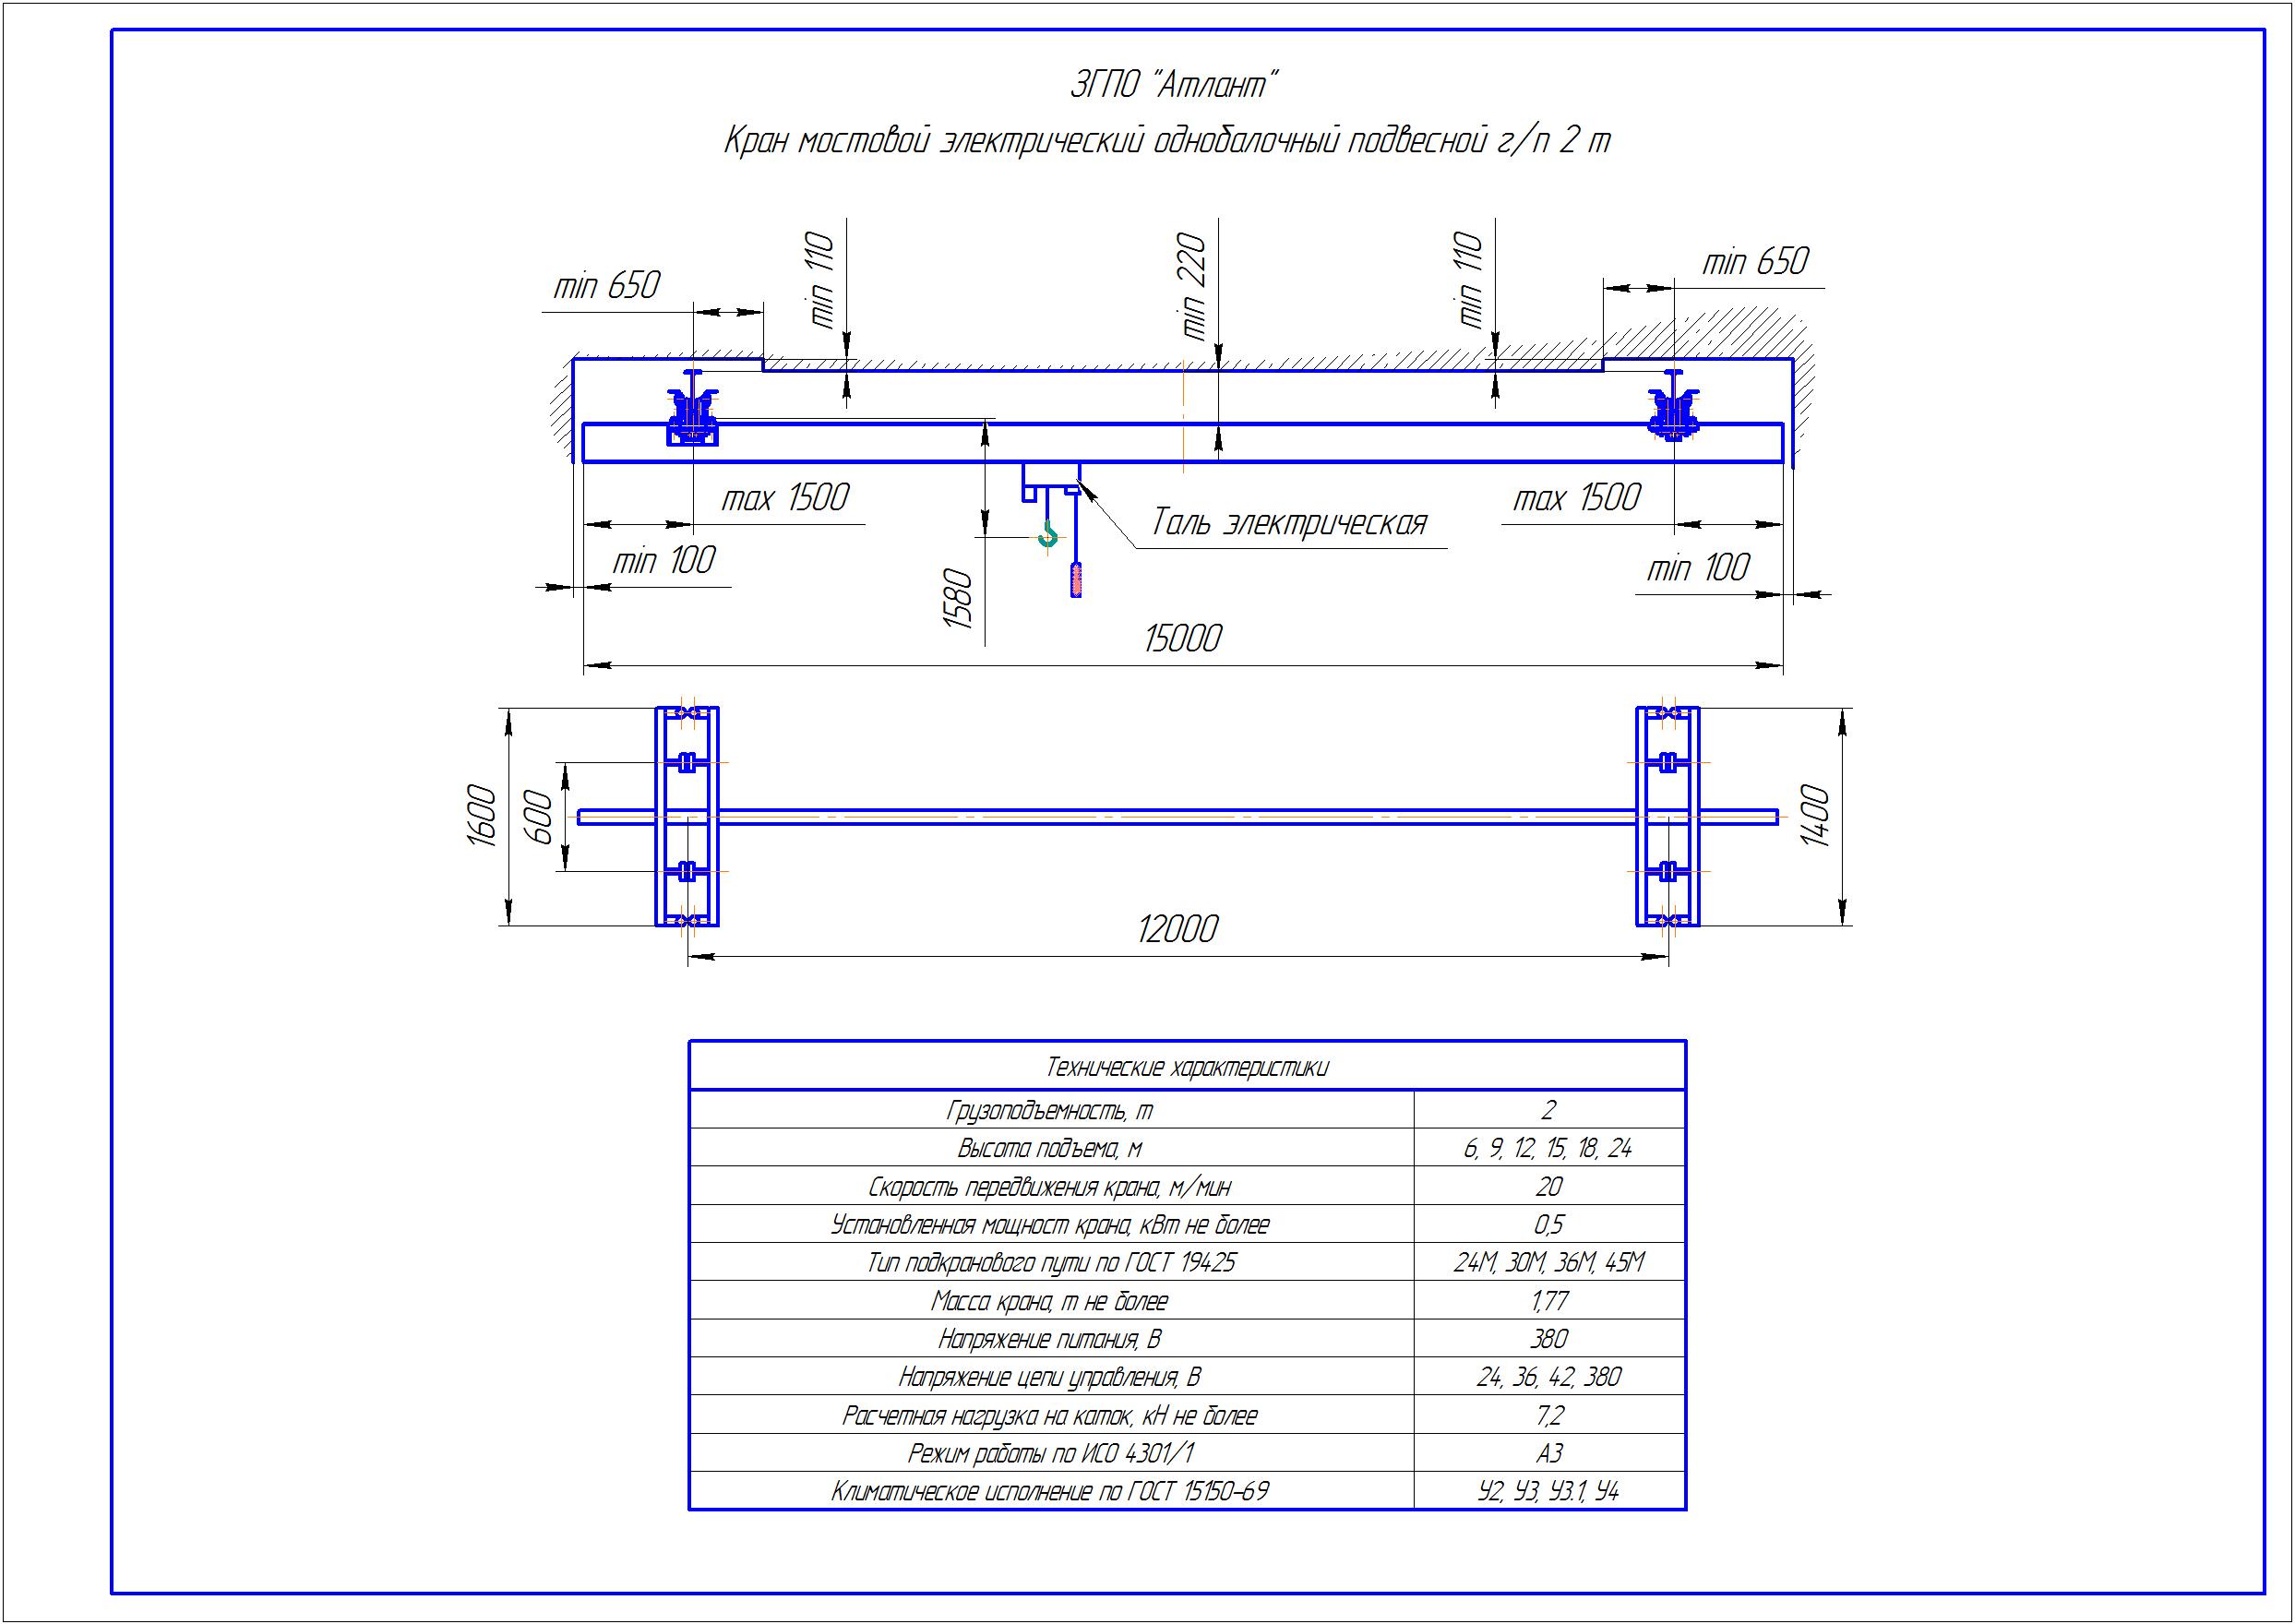 KBP 2 4 - Подвесная кран балка